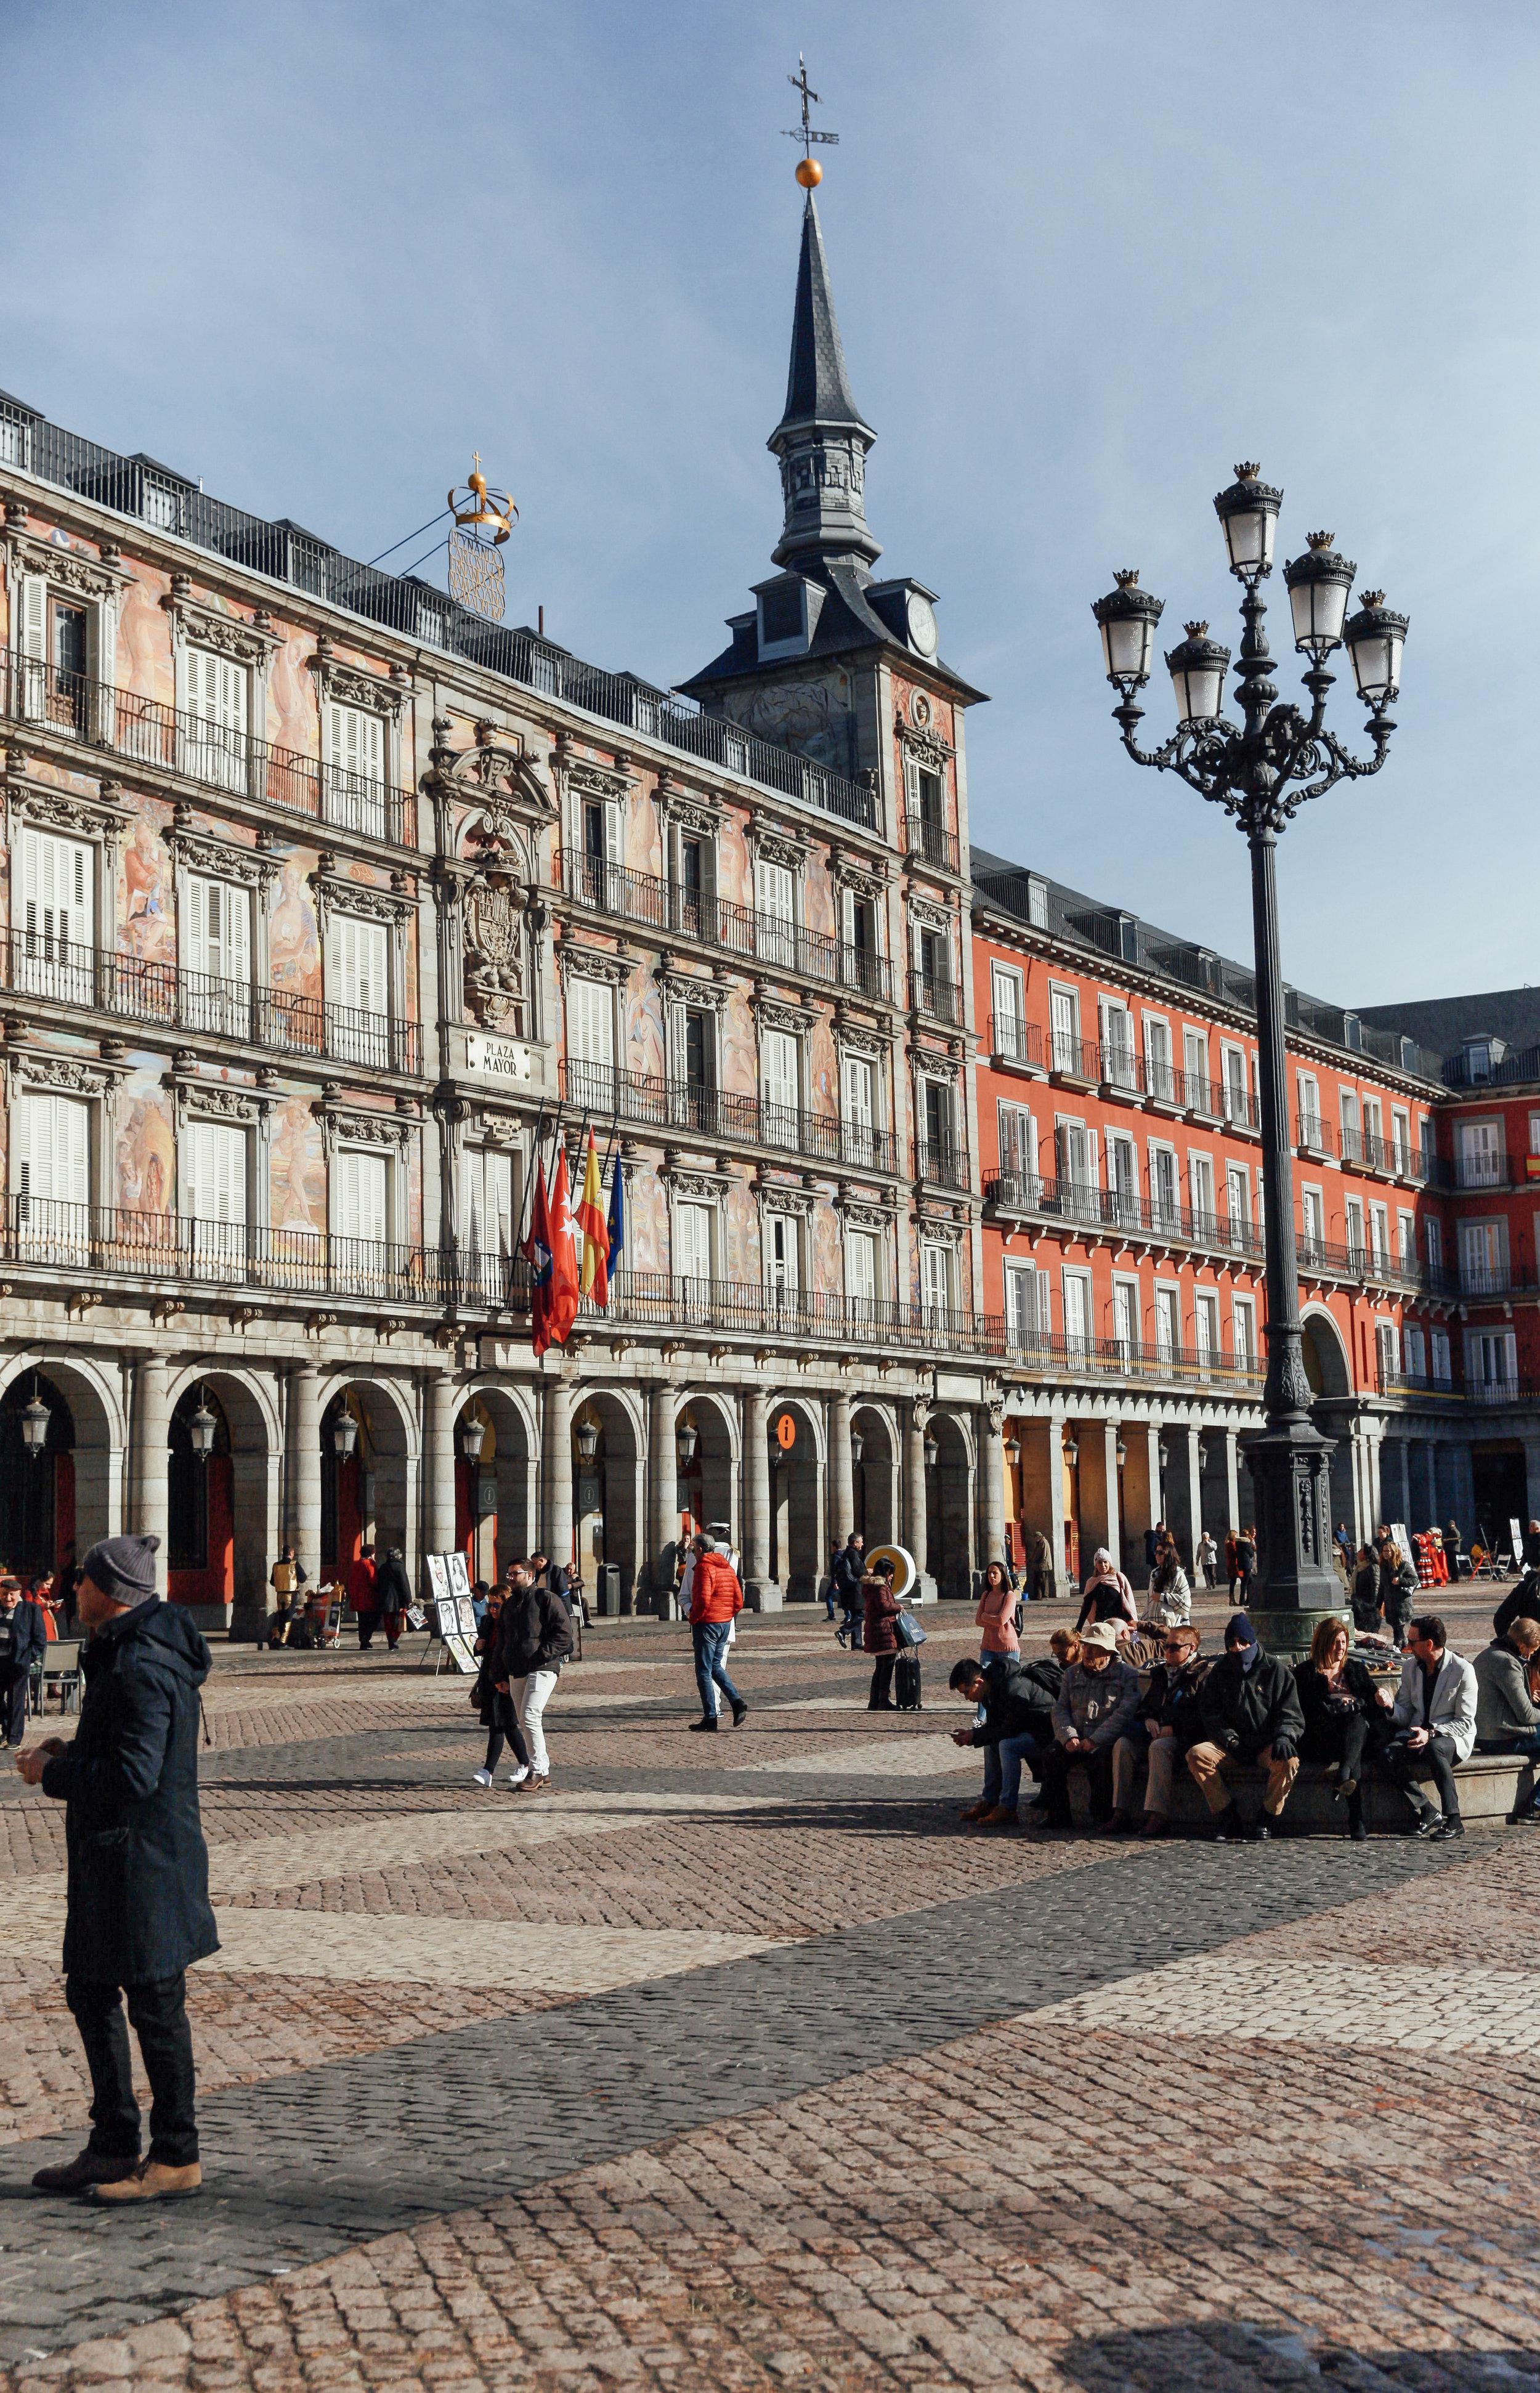 Plaza Mayor - Main Square